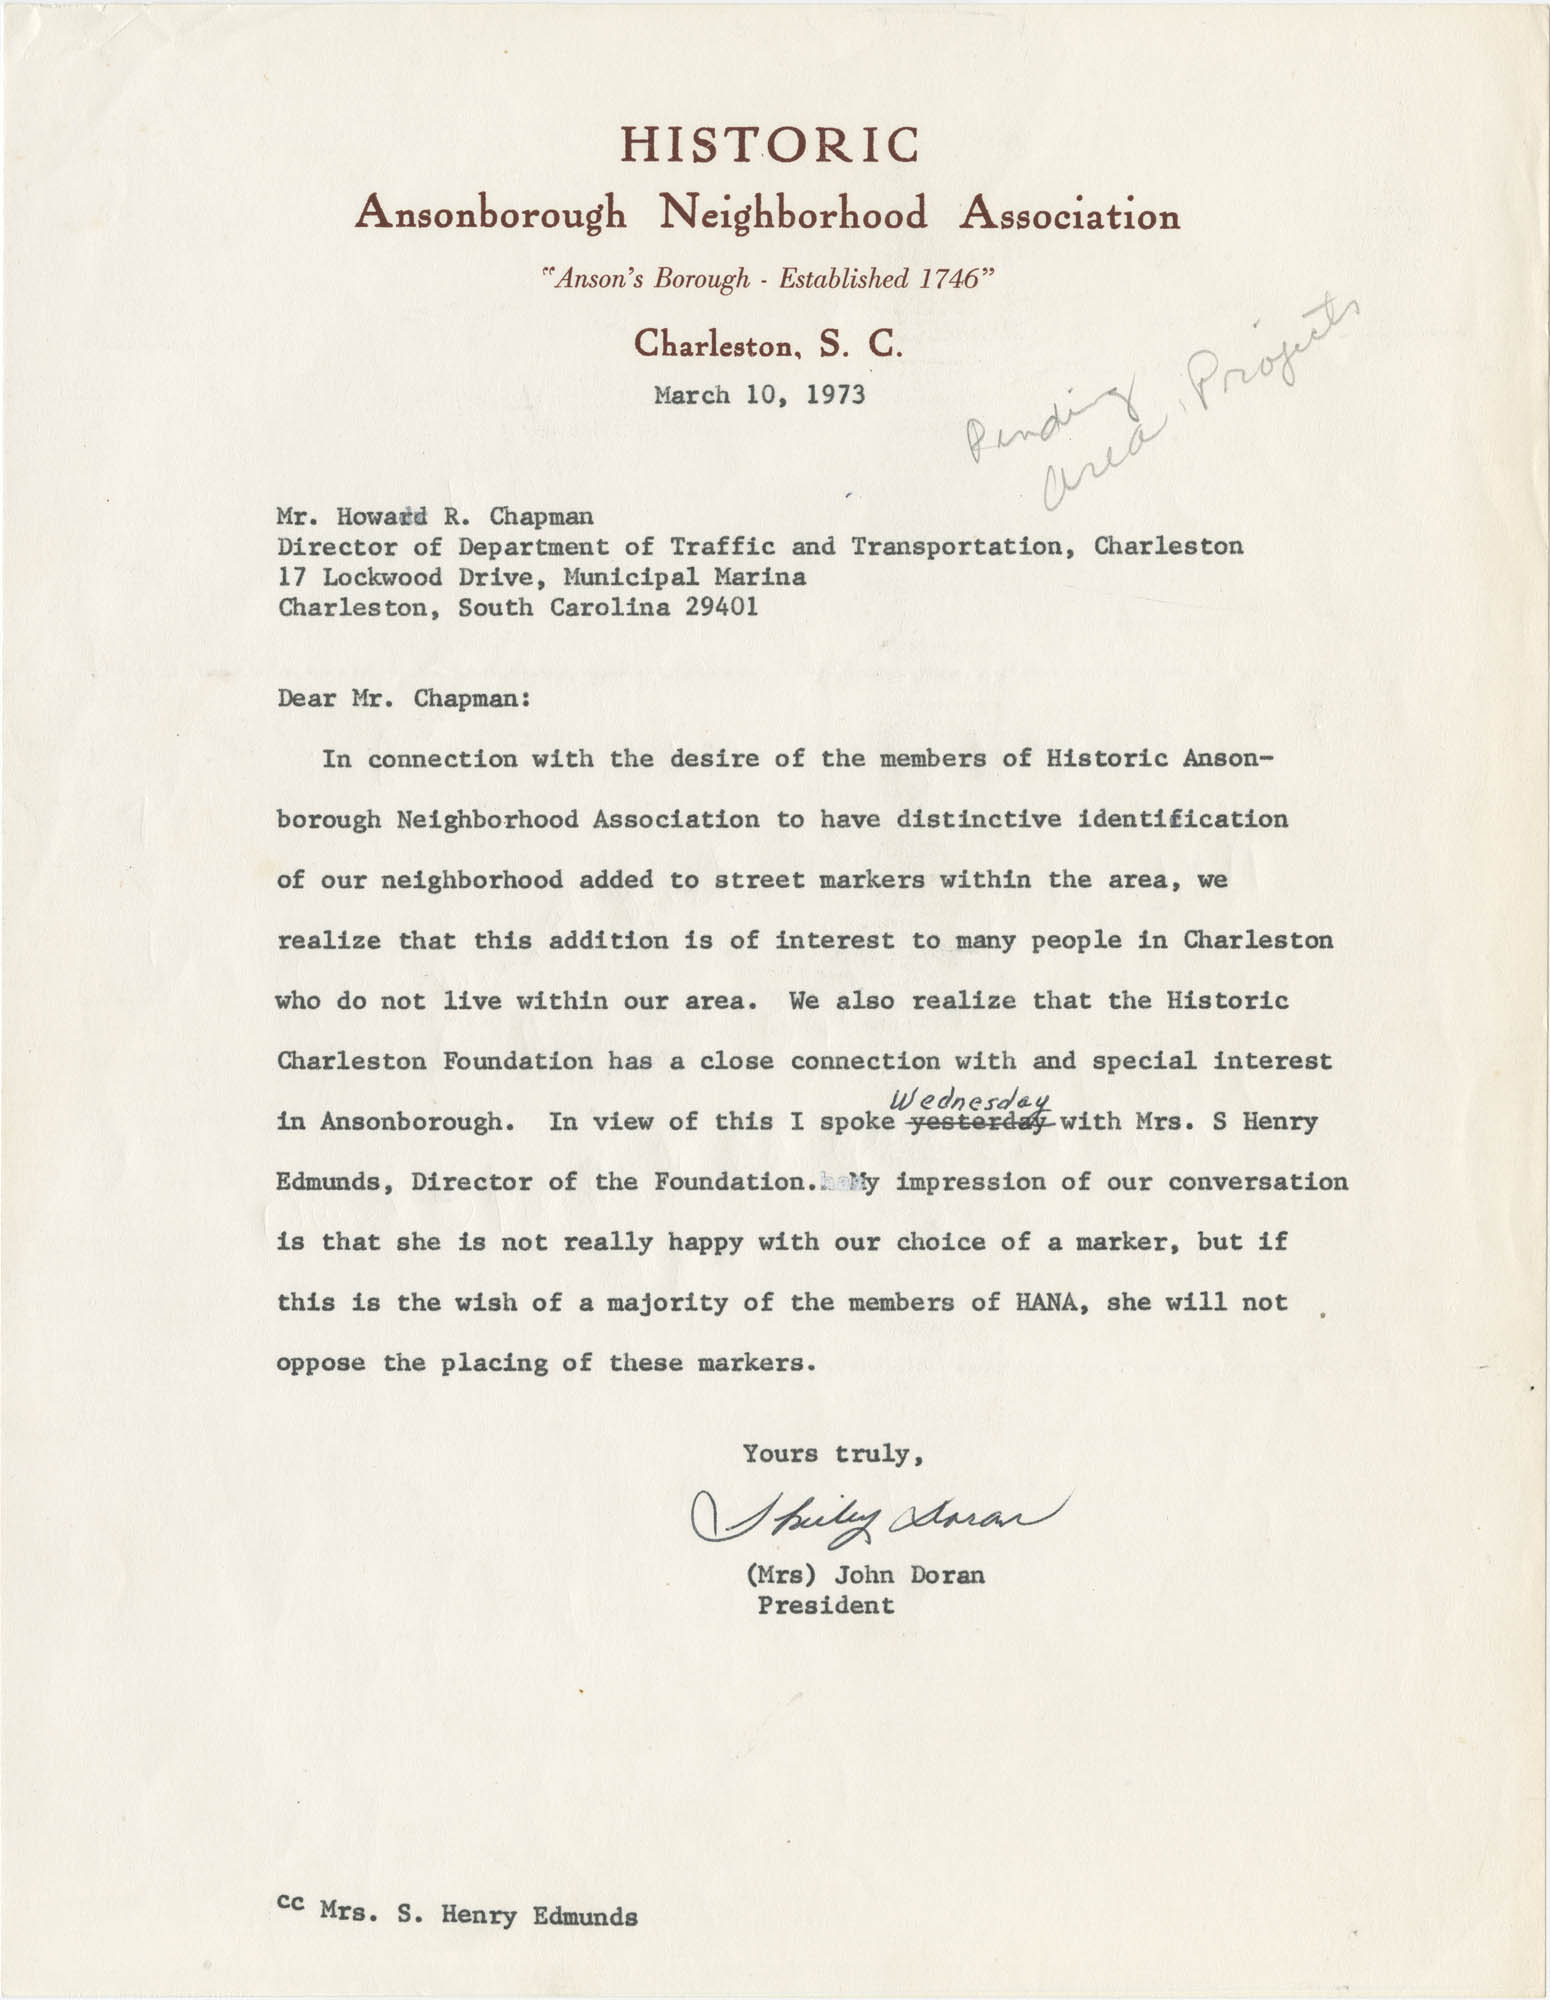 Letter from Mrs. John Doran to Howard R. Chapman